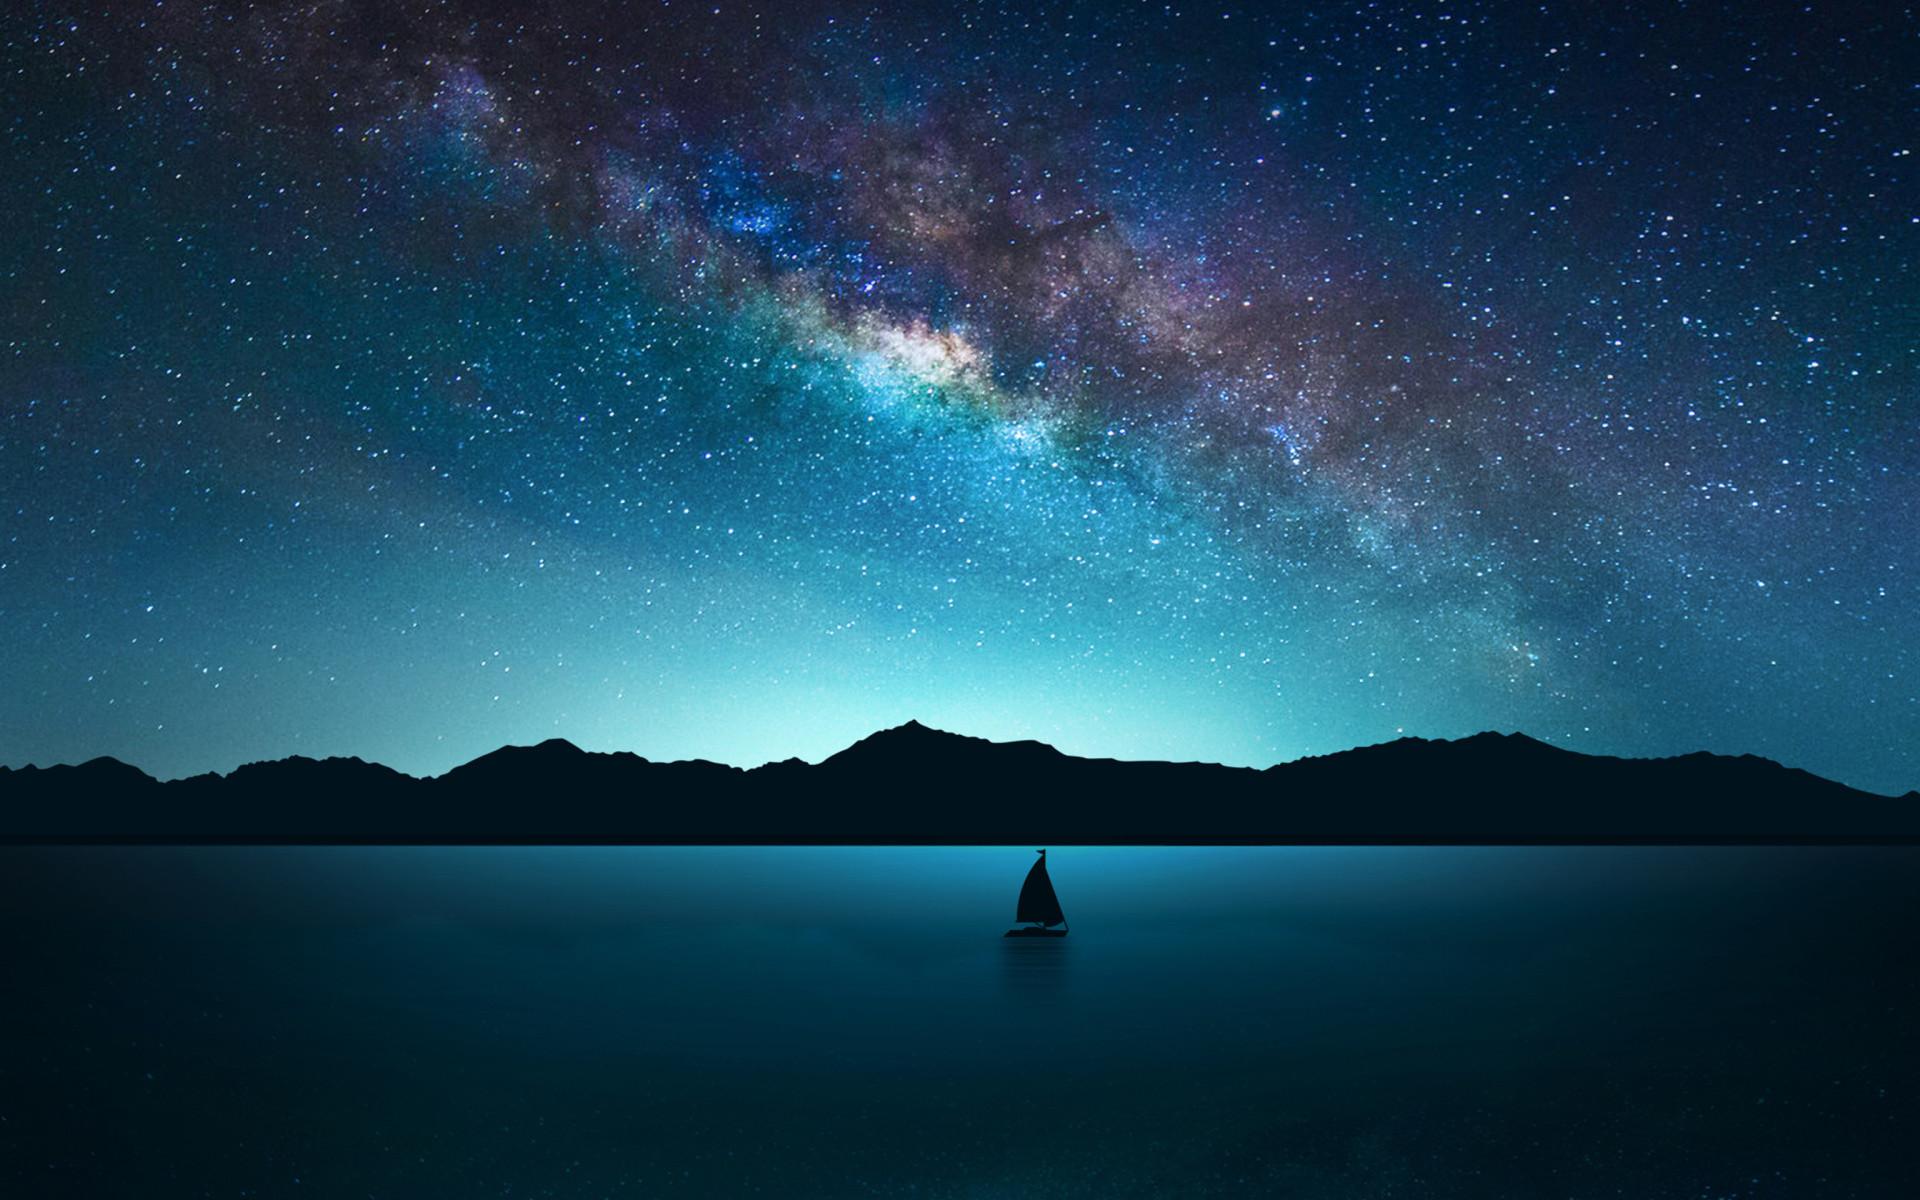 94+ Best HD Sky Full Of Stars Wallpapers, 6276391 1920×1200